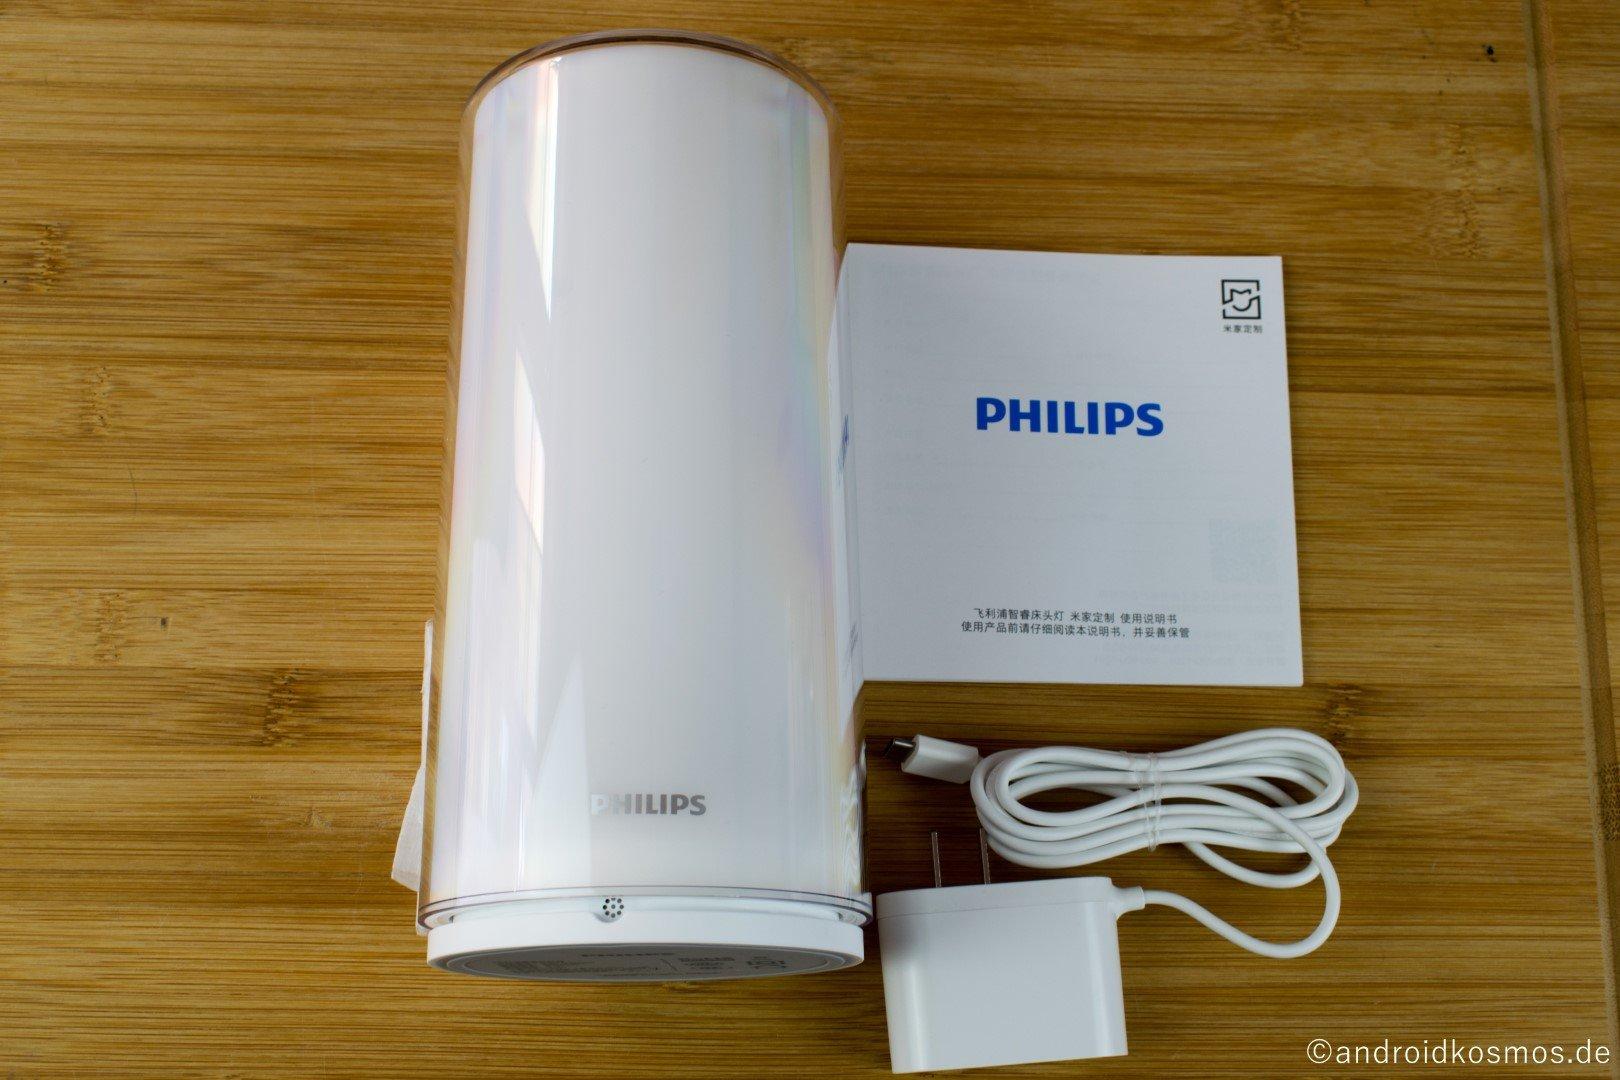 Philips Zhirui AndroidKosmos.de 3631